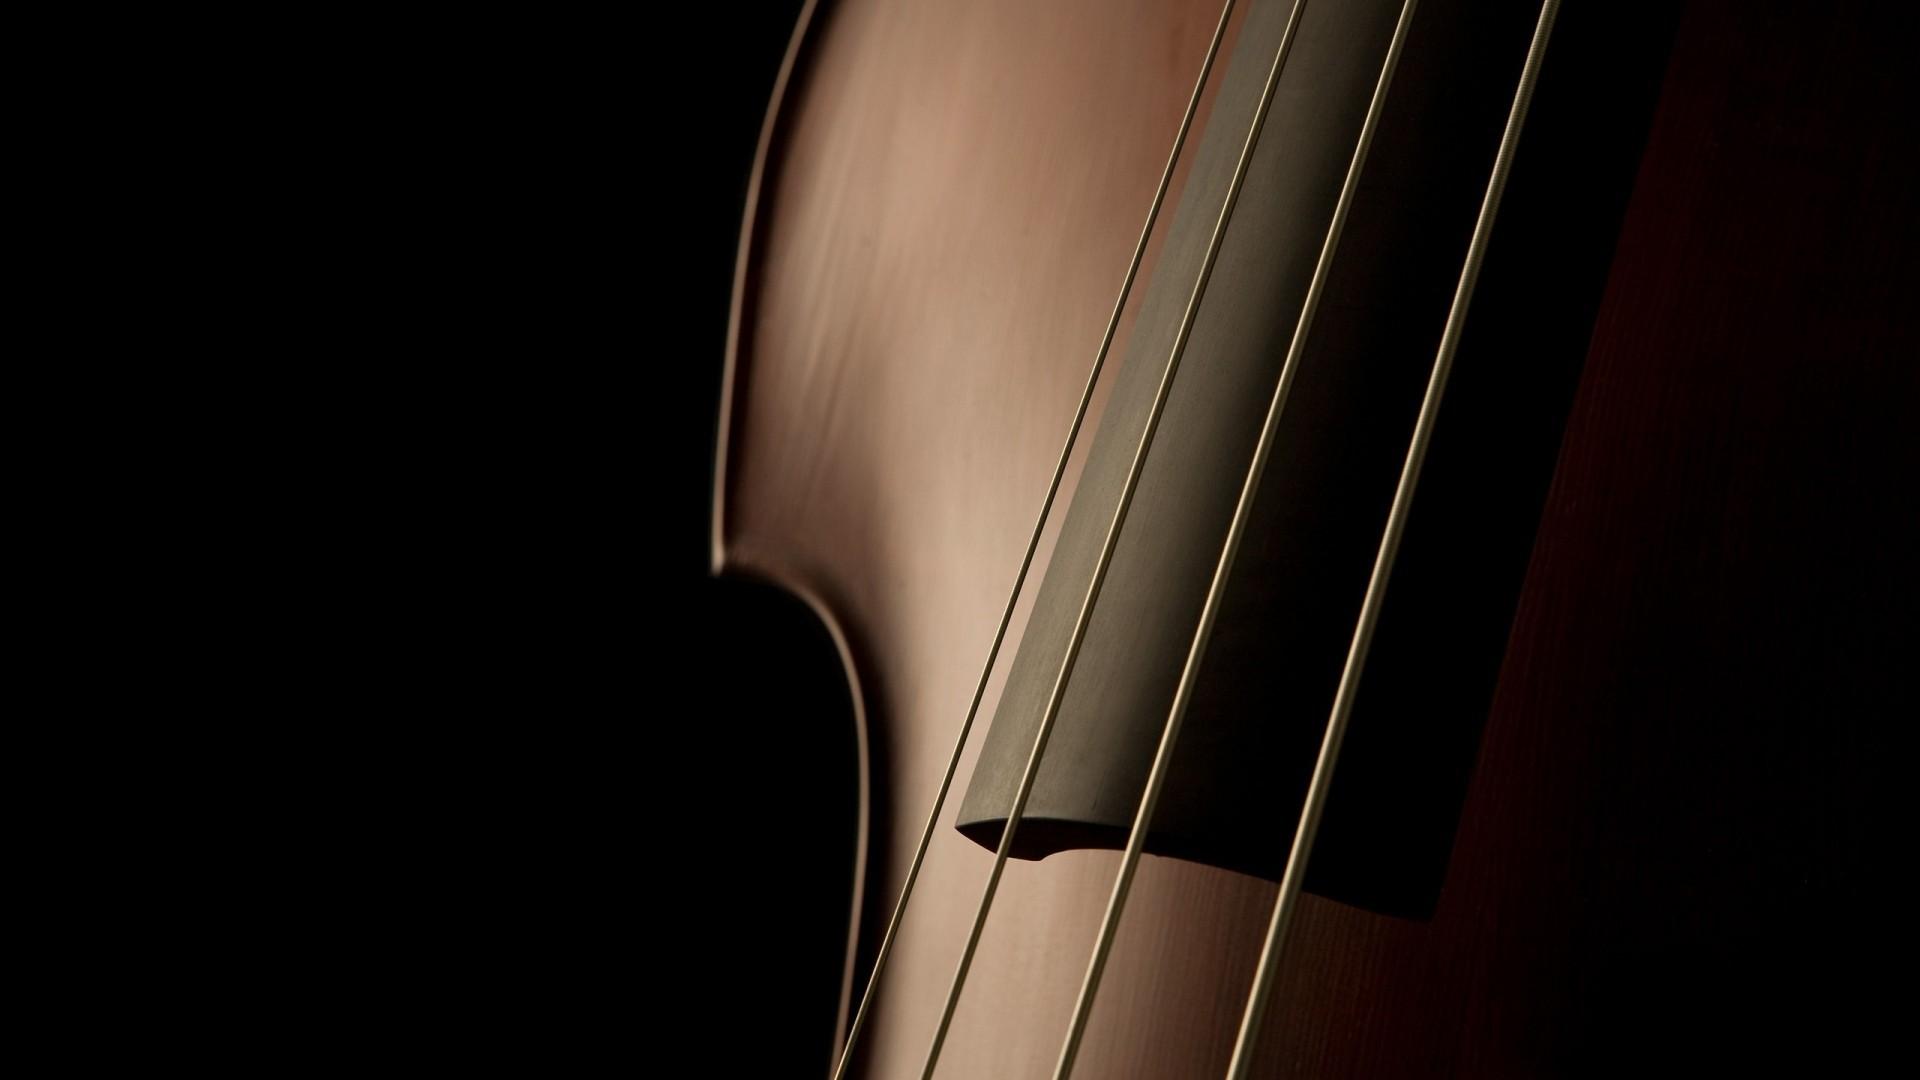 Preview wallpaper violin, shape, strings, elegant, refined 1920×1080